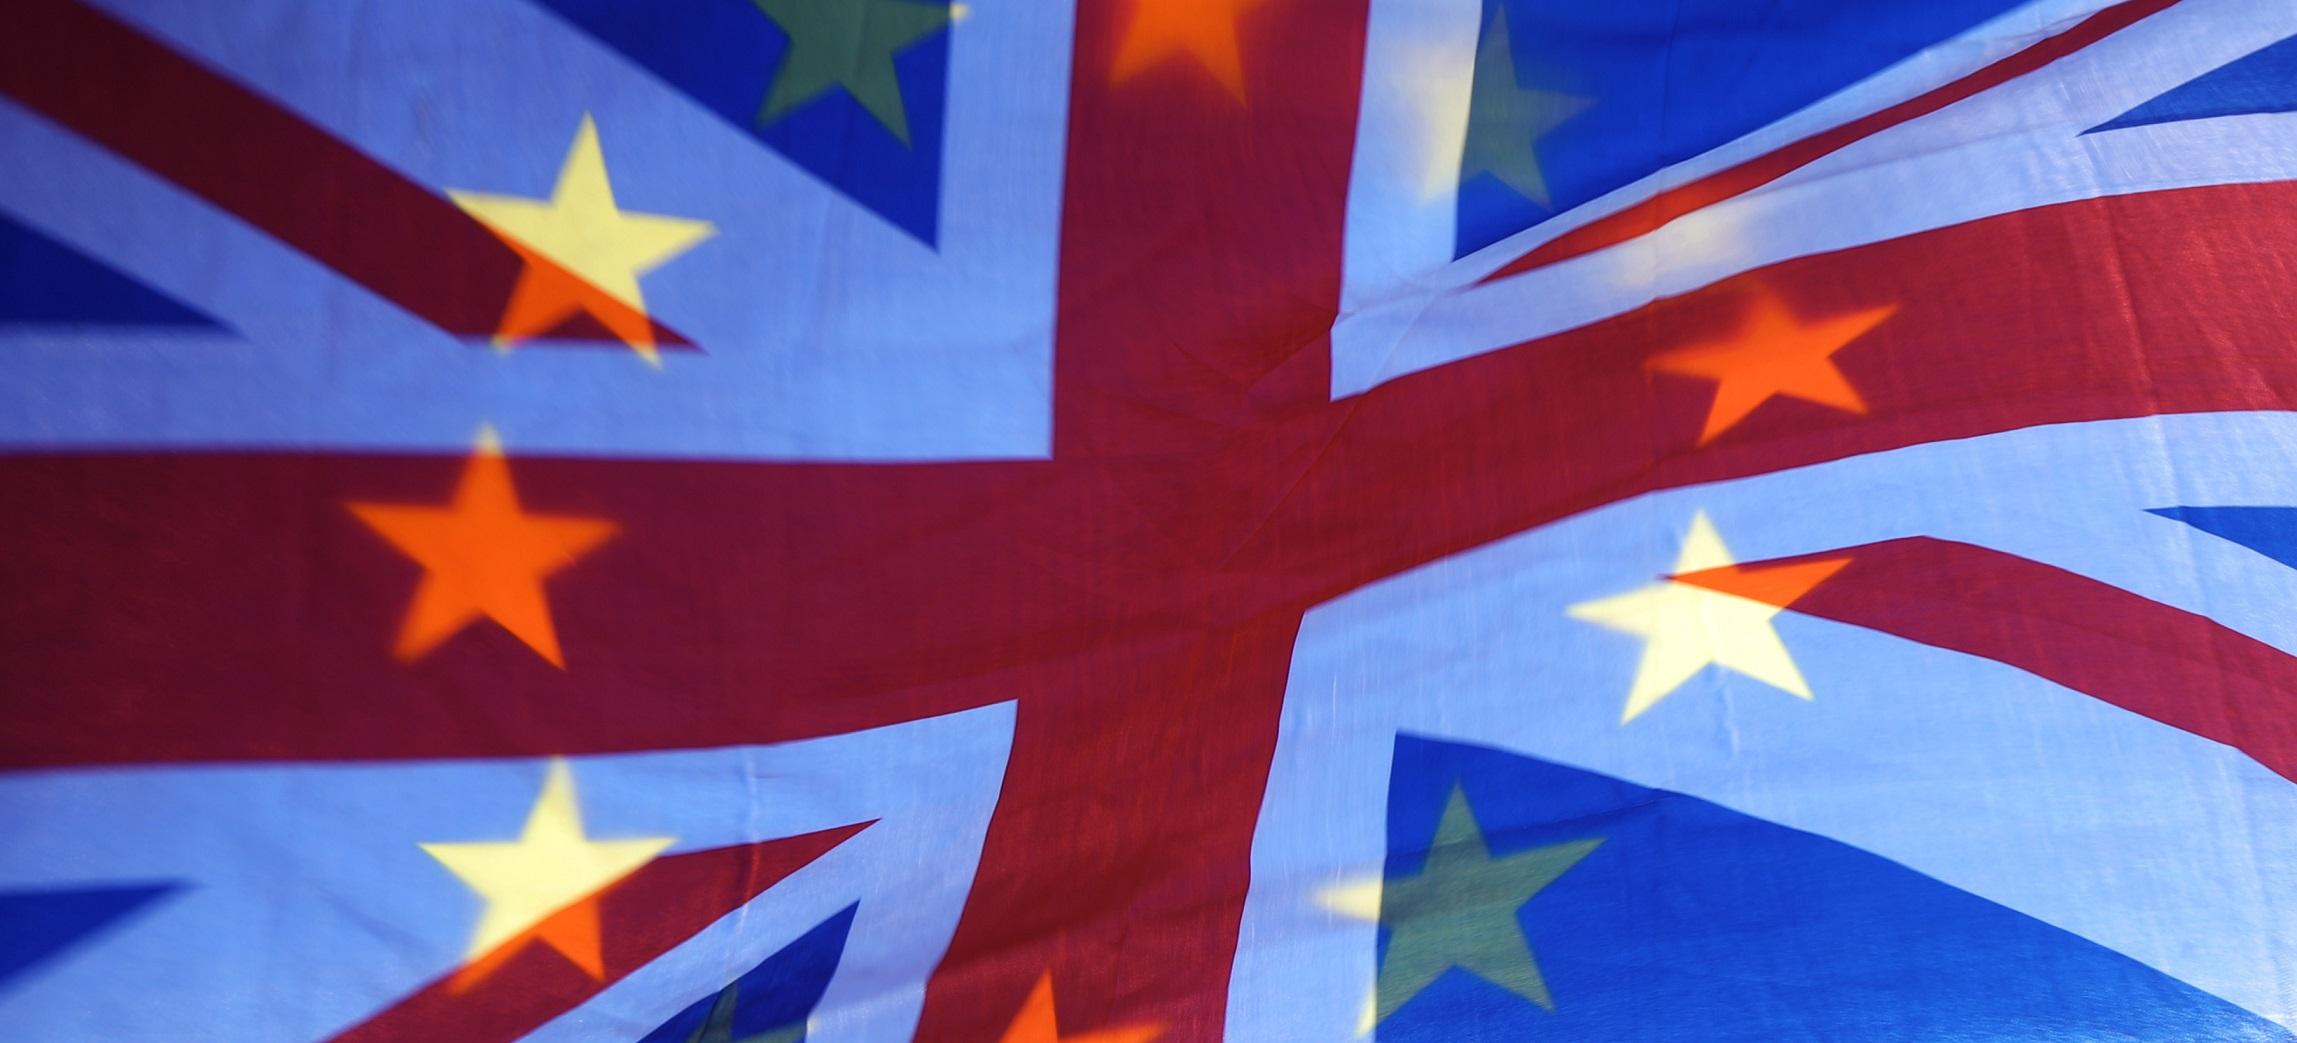 Union jack with EU stars - Brexit